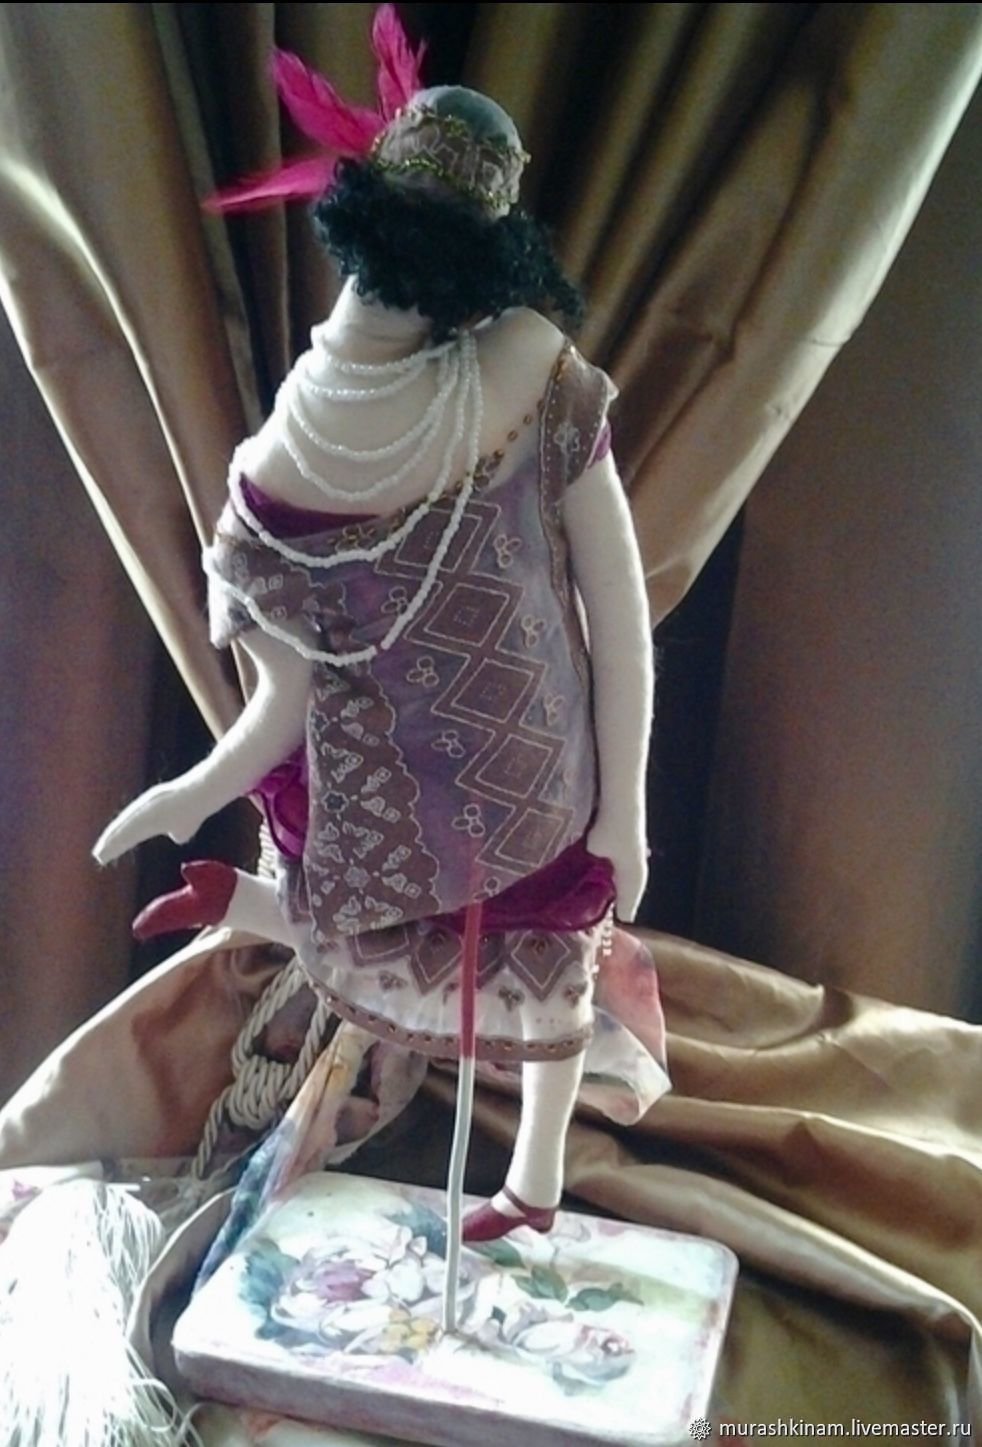 99aaf22d0c05df1491a3435cbb6d kukly i igrushki charlston art deko interernaya tekstilnaya ku